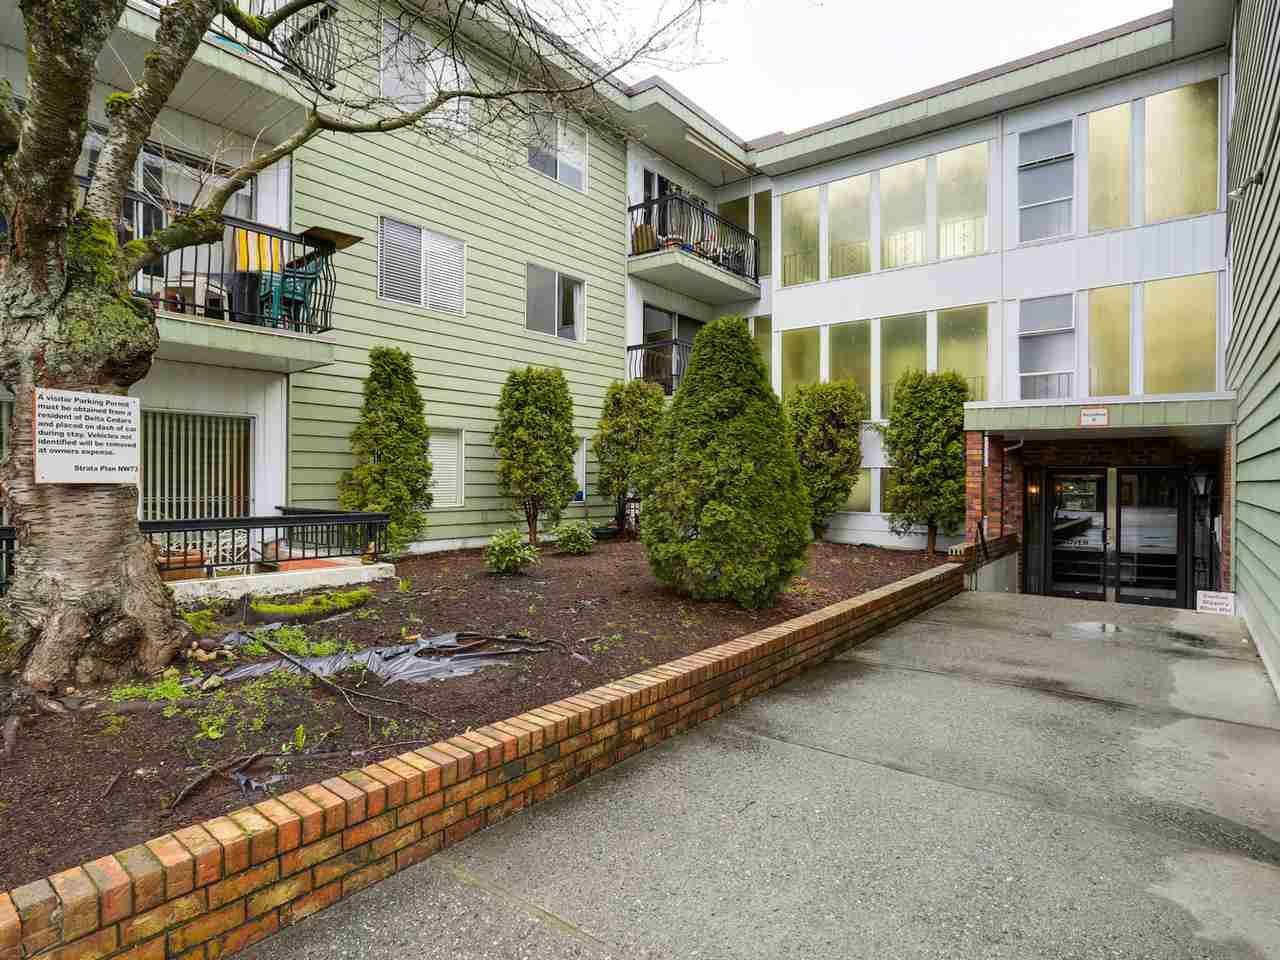 "Photo 2: Photos: 278C 8635 120 Street in Delta: Annieville Condo for sale in ""Delta Cedars"" (N. Delta)  : MLS®# R2037207"